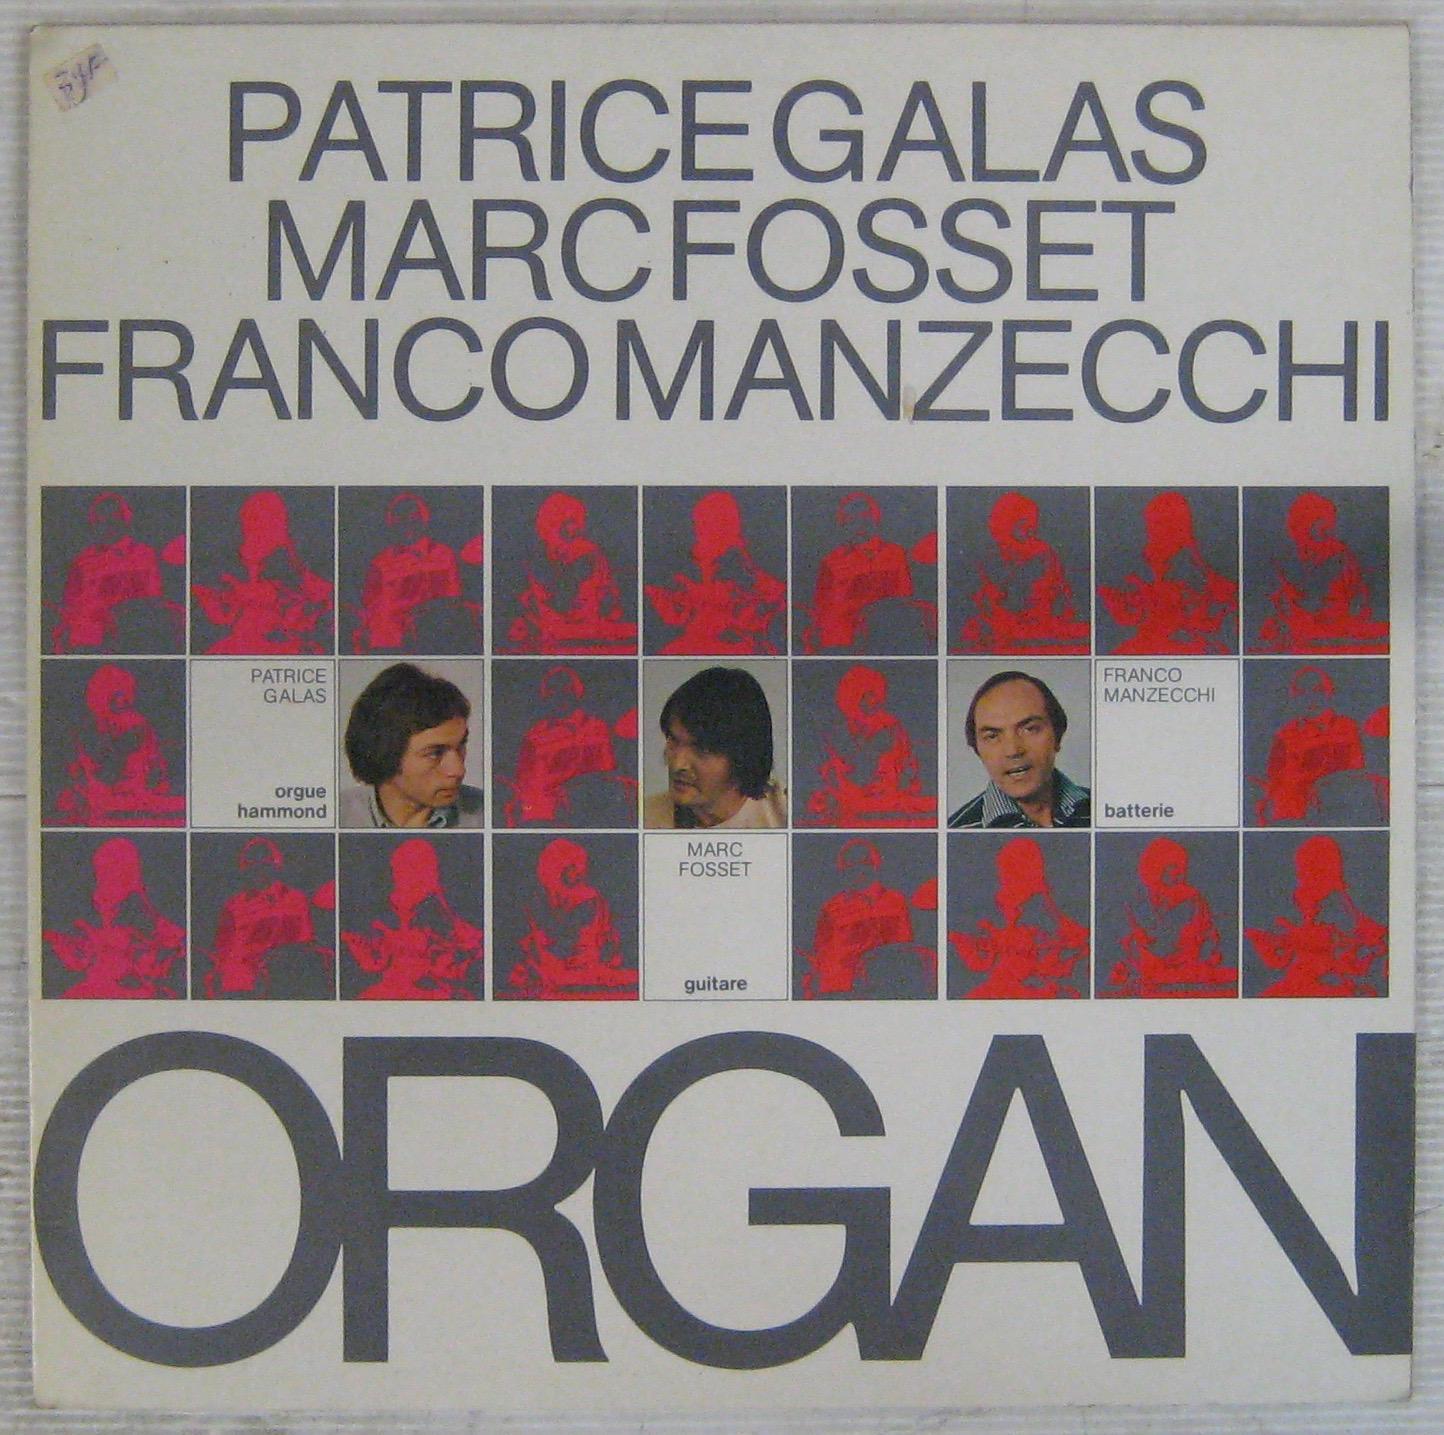 GALAS FOSSET MANZECCHI - Organ - LP